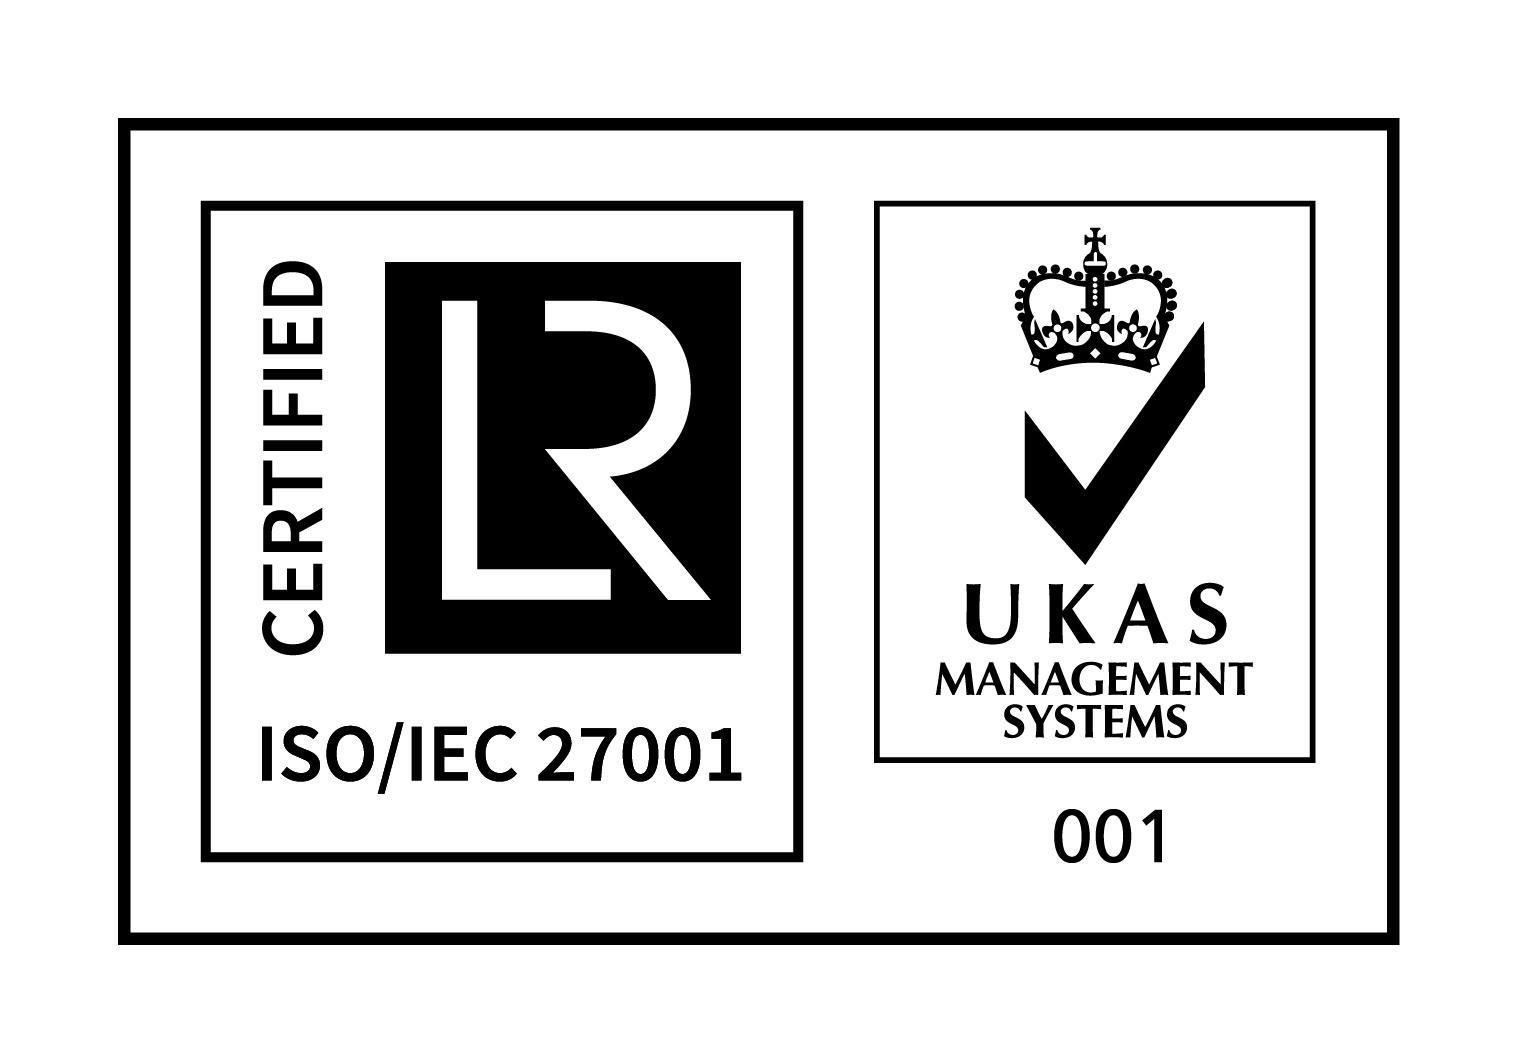 ISO 27001 UKAS